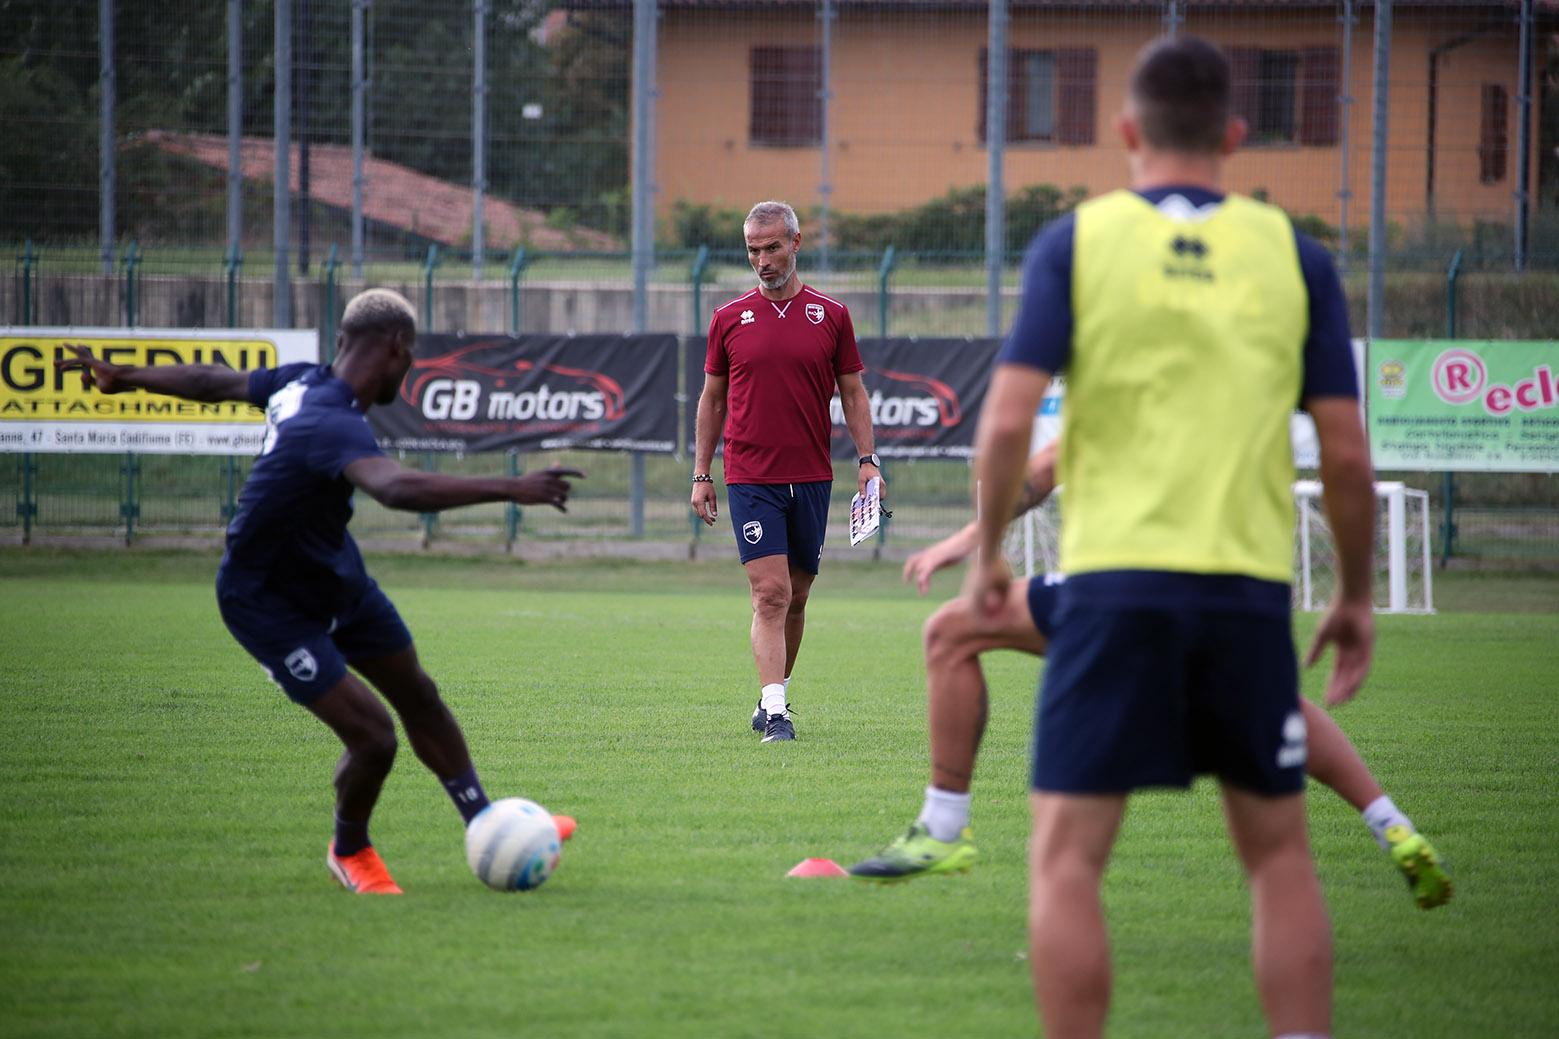 Calcio, Imolese - Triestina mercoledì 4 dicembre